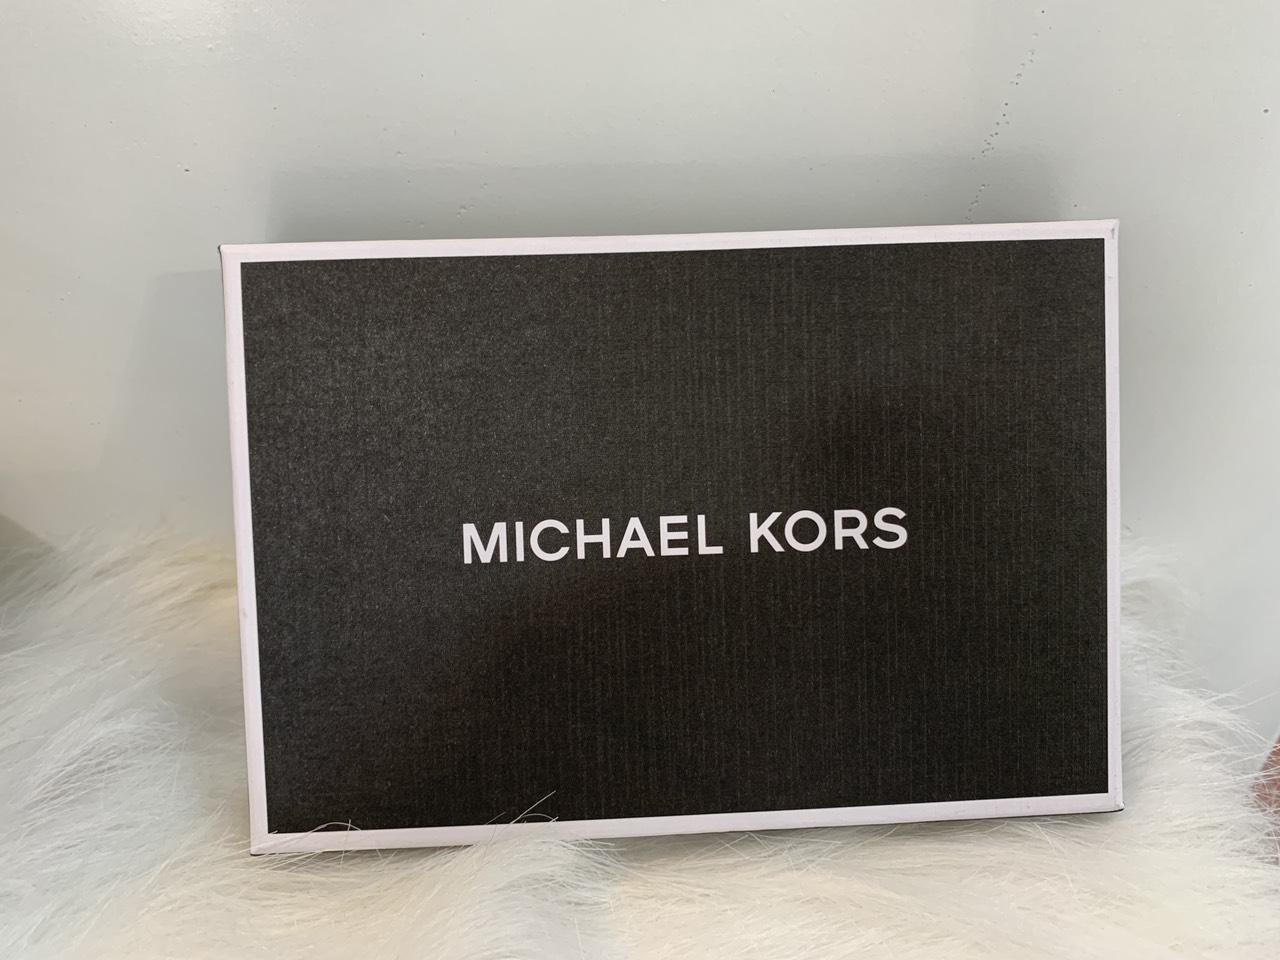 Michael Kors gấp GIFTING SLIM BILL W KEY BOX SET LEATHER- NAVY vi michael kors nam  gap mini danh cho nam